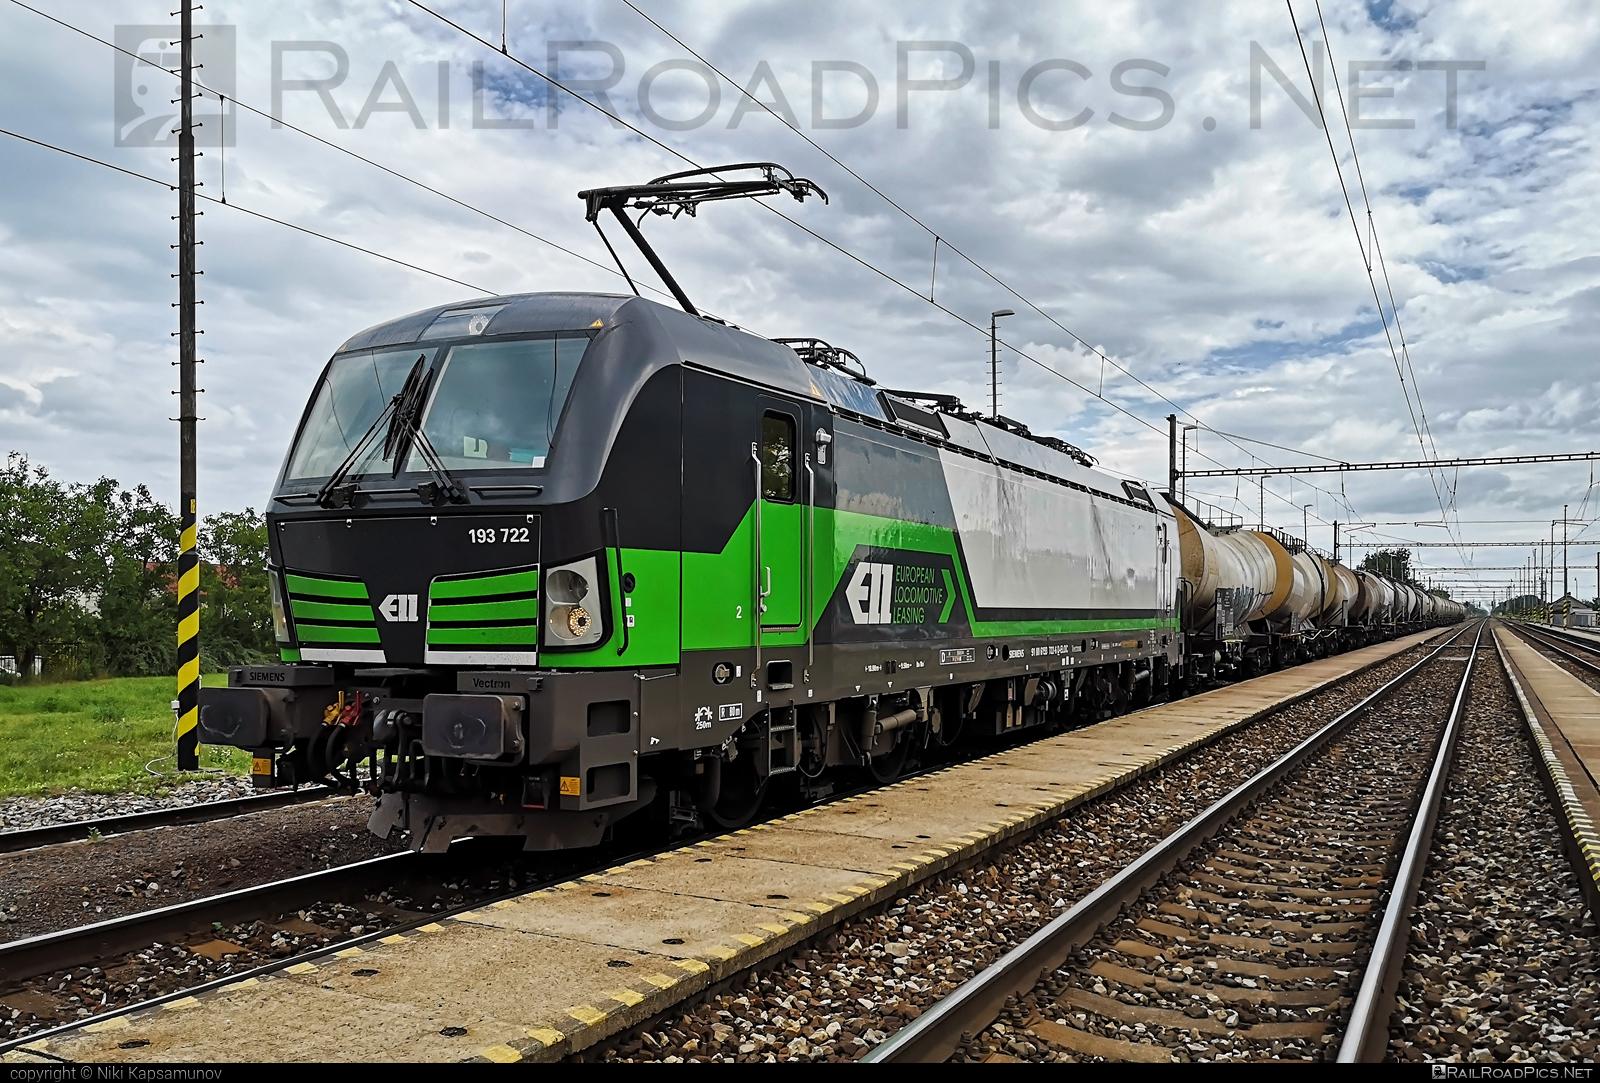 Siemens Vectron MS - 193 722 operated by Salzburger Eisenbahn Transportlogistik GmbH #SalzburgerEisenbahnTransportlogistik #SalzburgerEisenbahnTransportlogistikGmbH #ell #ellgermany #eloc #europeanlocomotiveleasing #setg #siemens #siemensvectron #siemensvectronms #vectron #vectronms